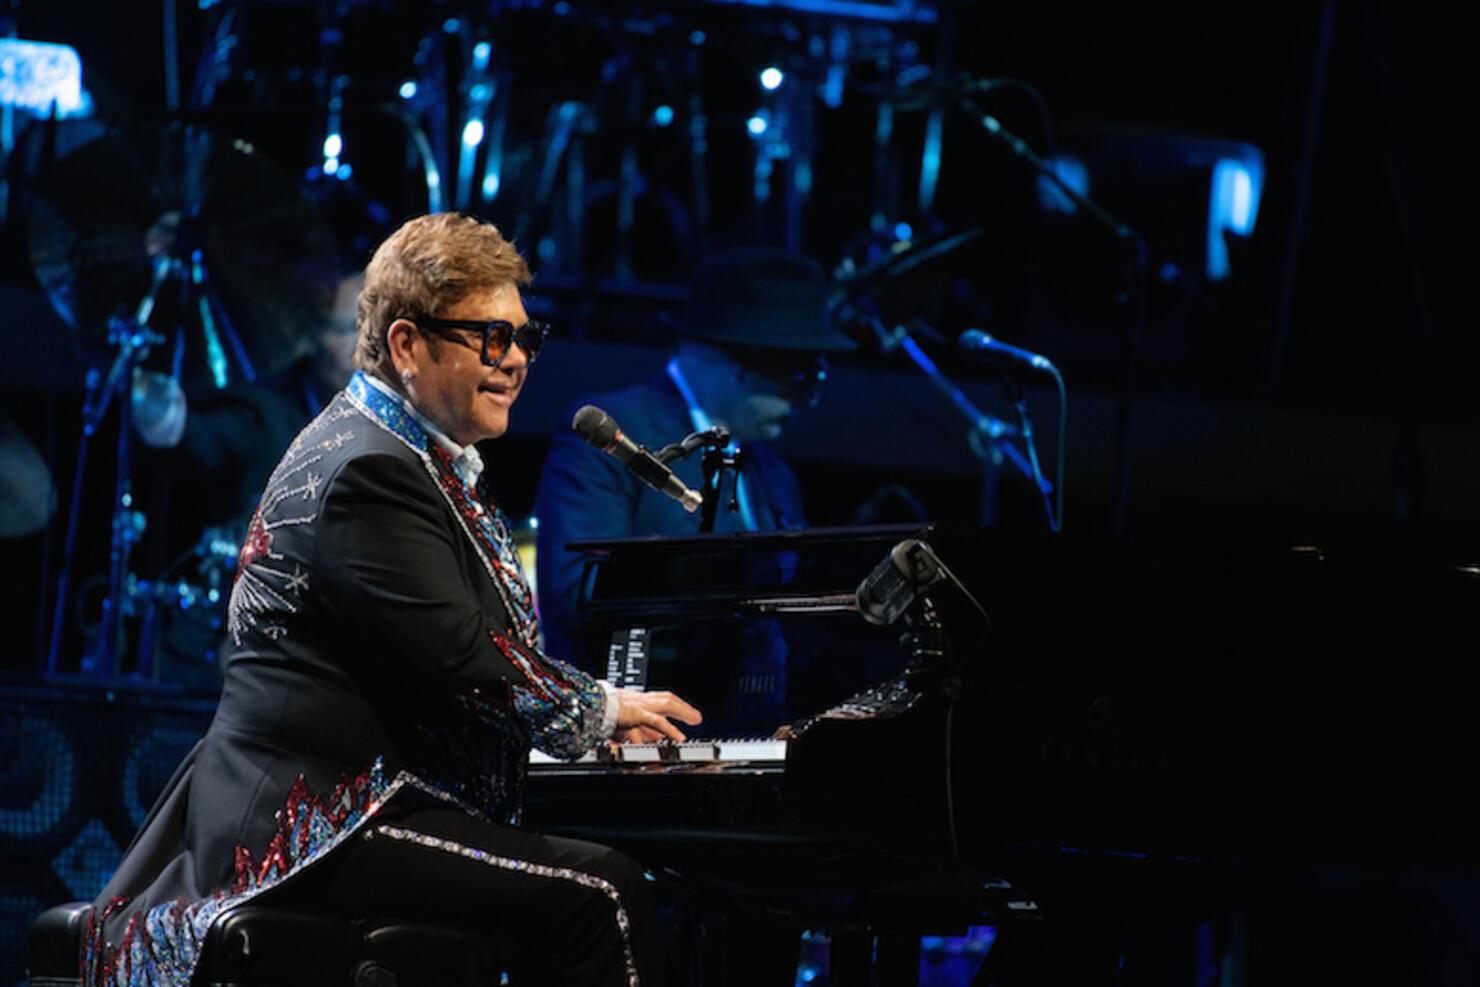 Elton John Performs In Gothenburg